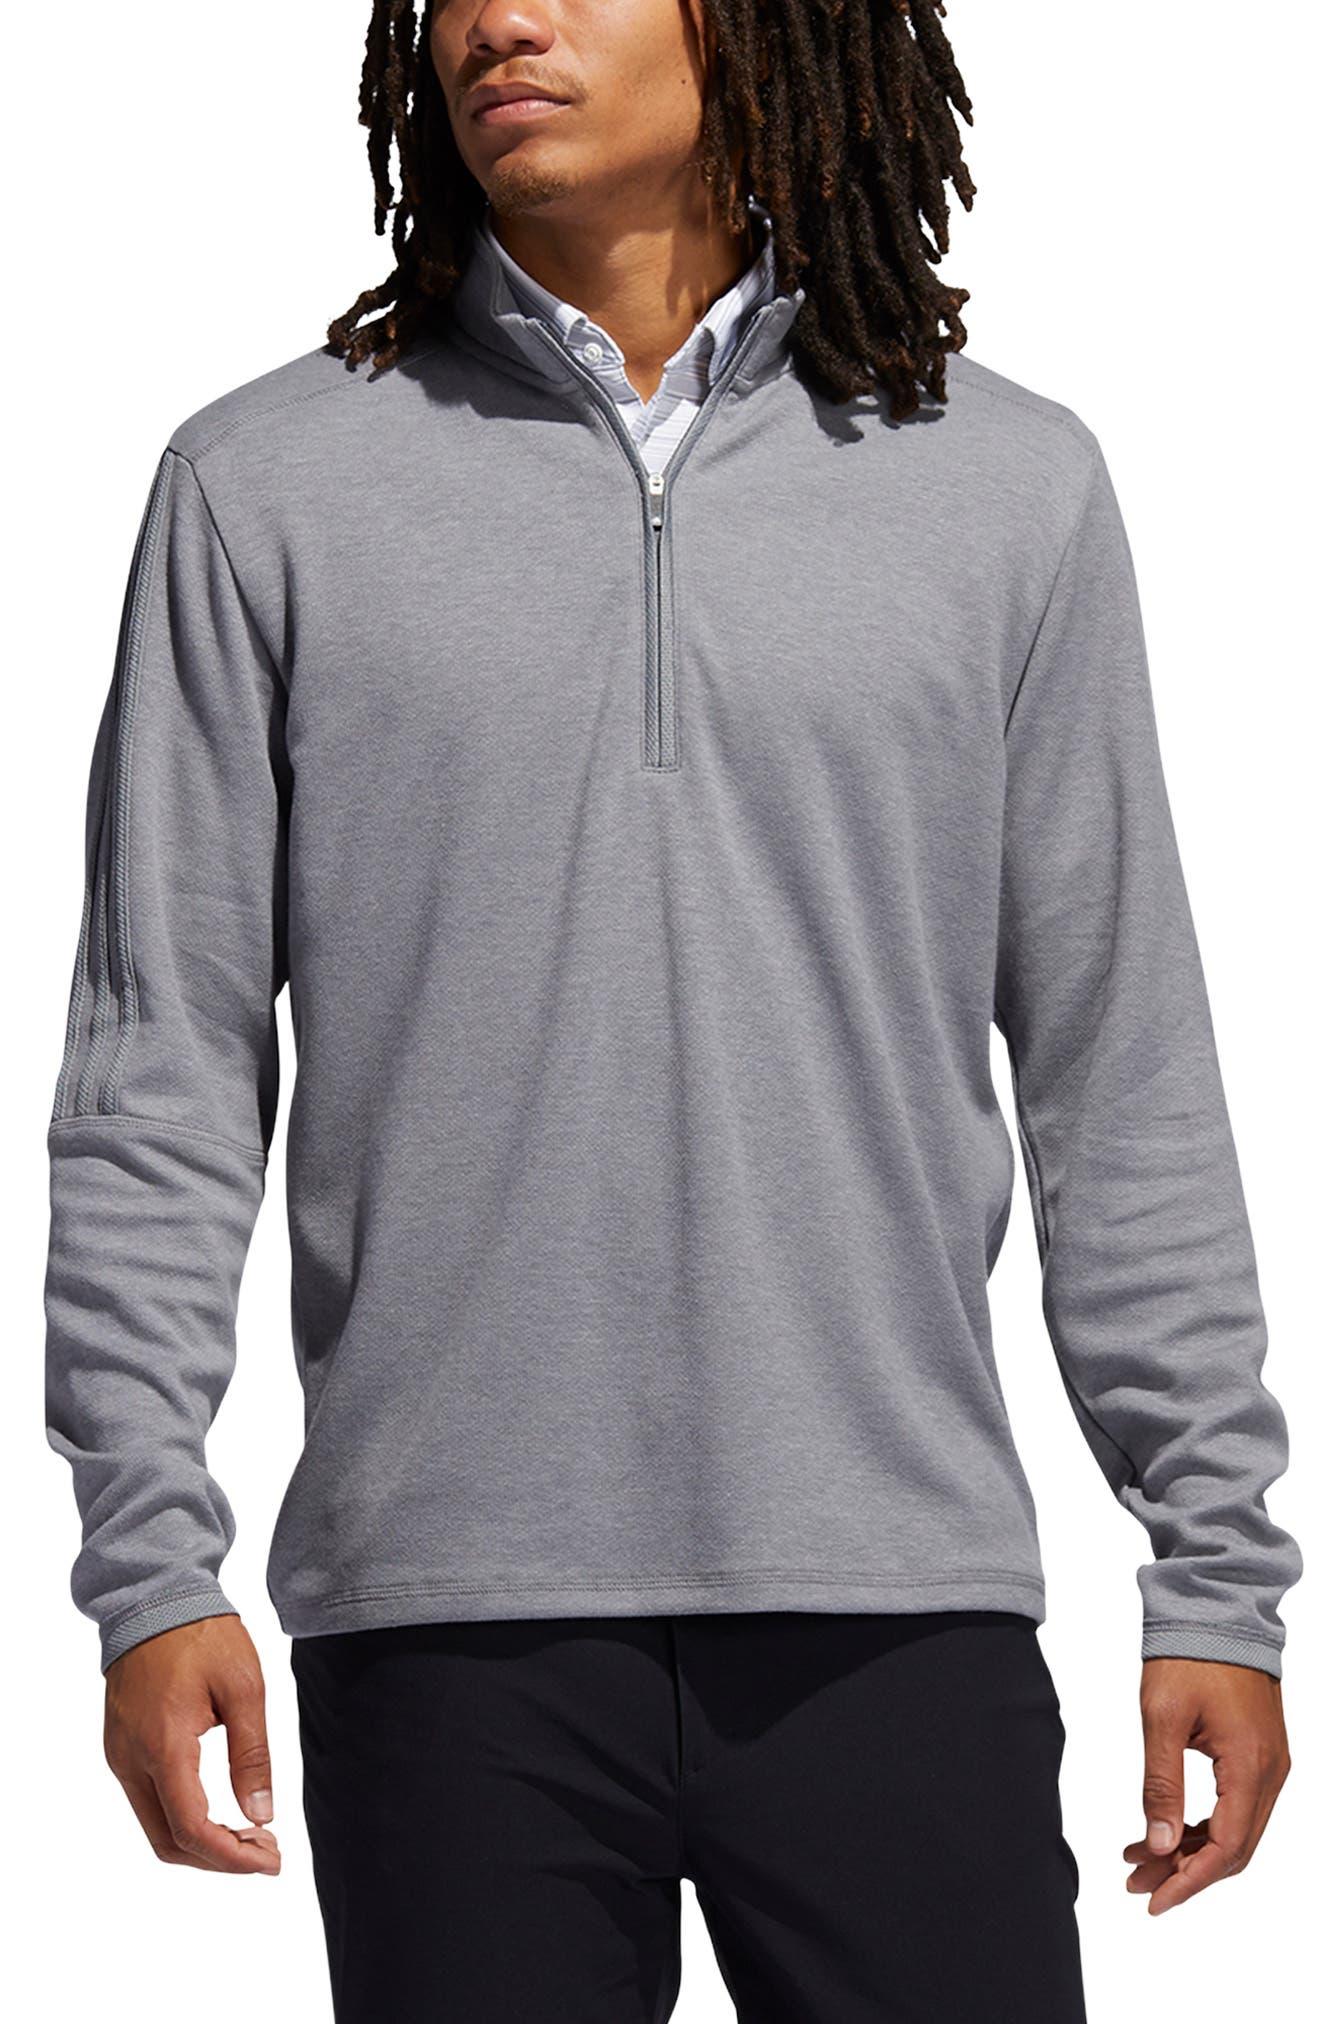 Men's Adidas Golf Men's 3-Stripes Quarter Zip Performance Pullover